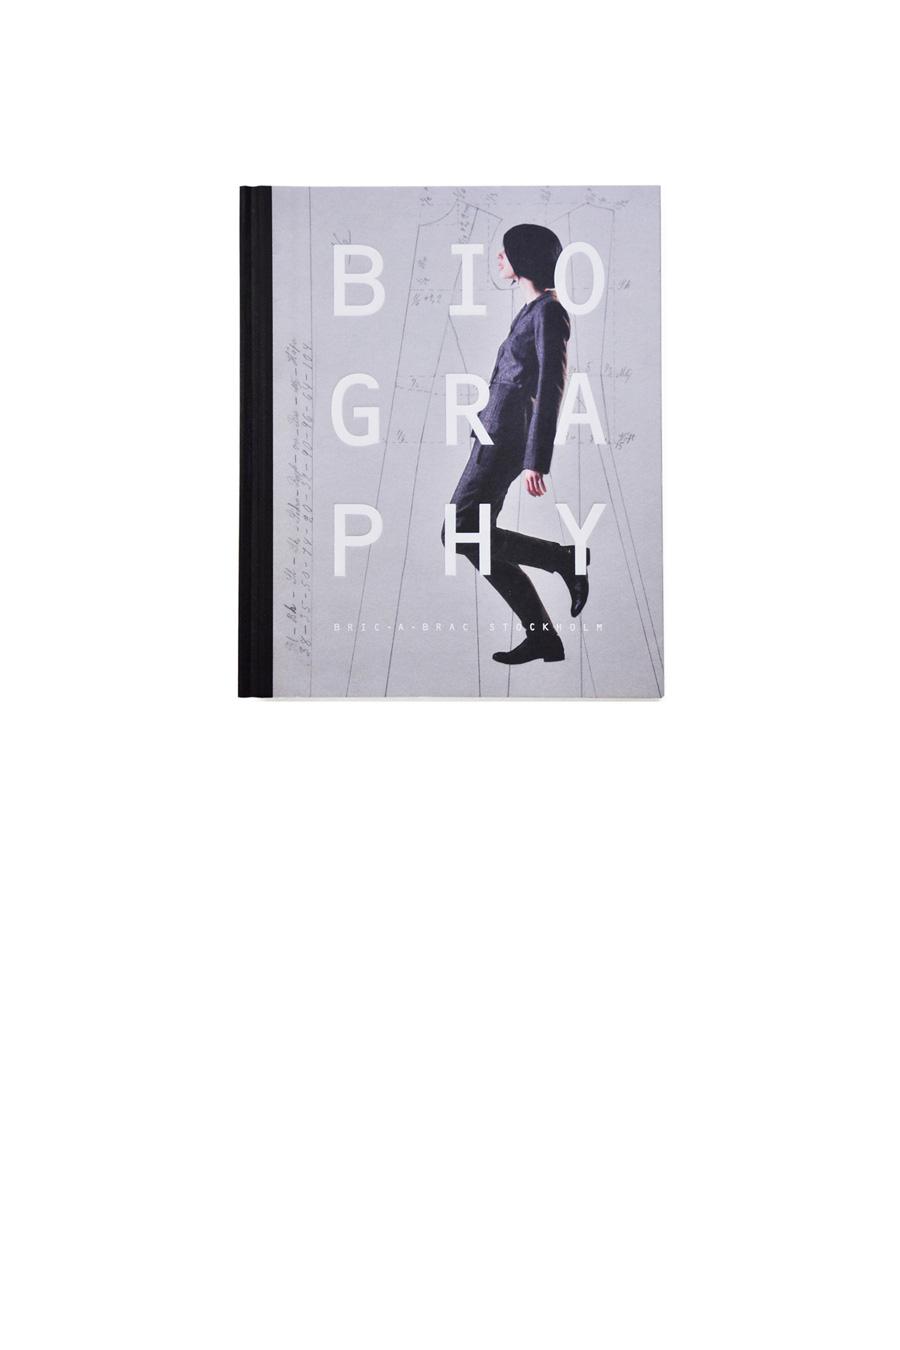 book: biography